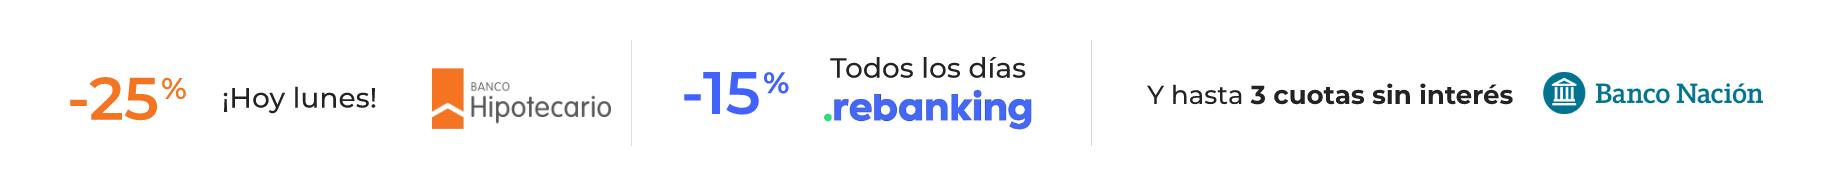 bank-section-big